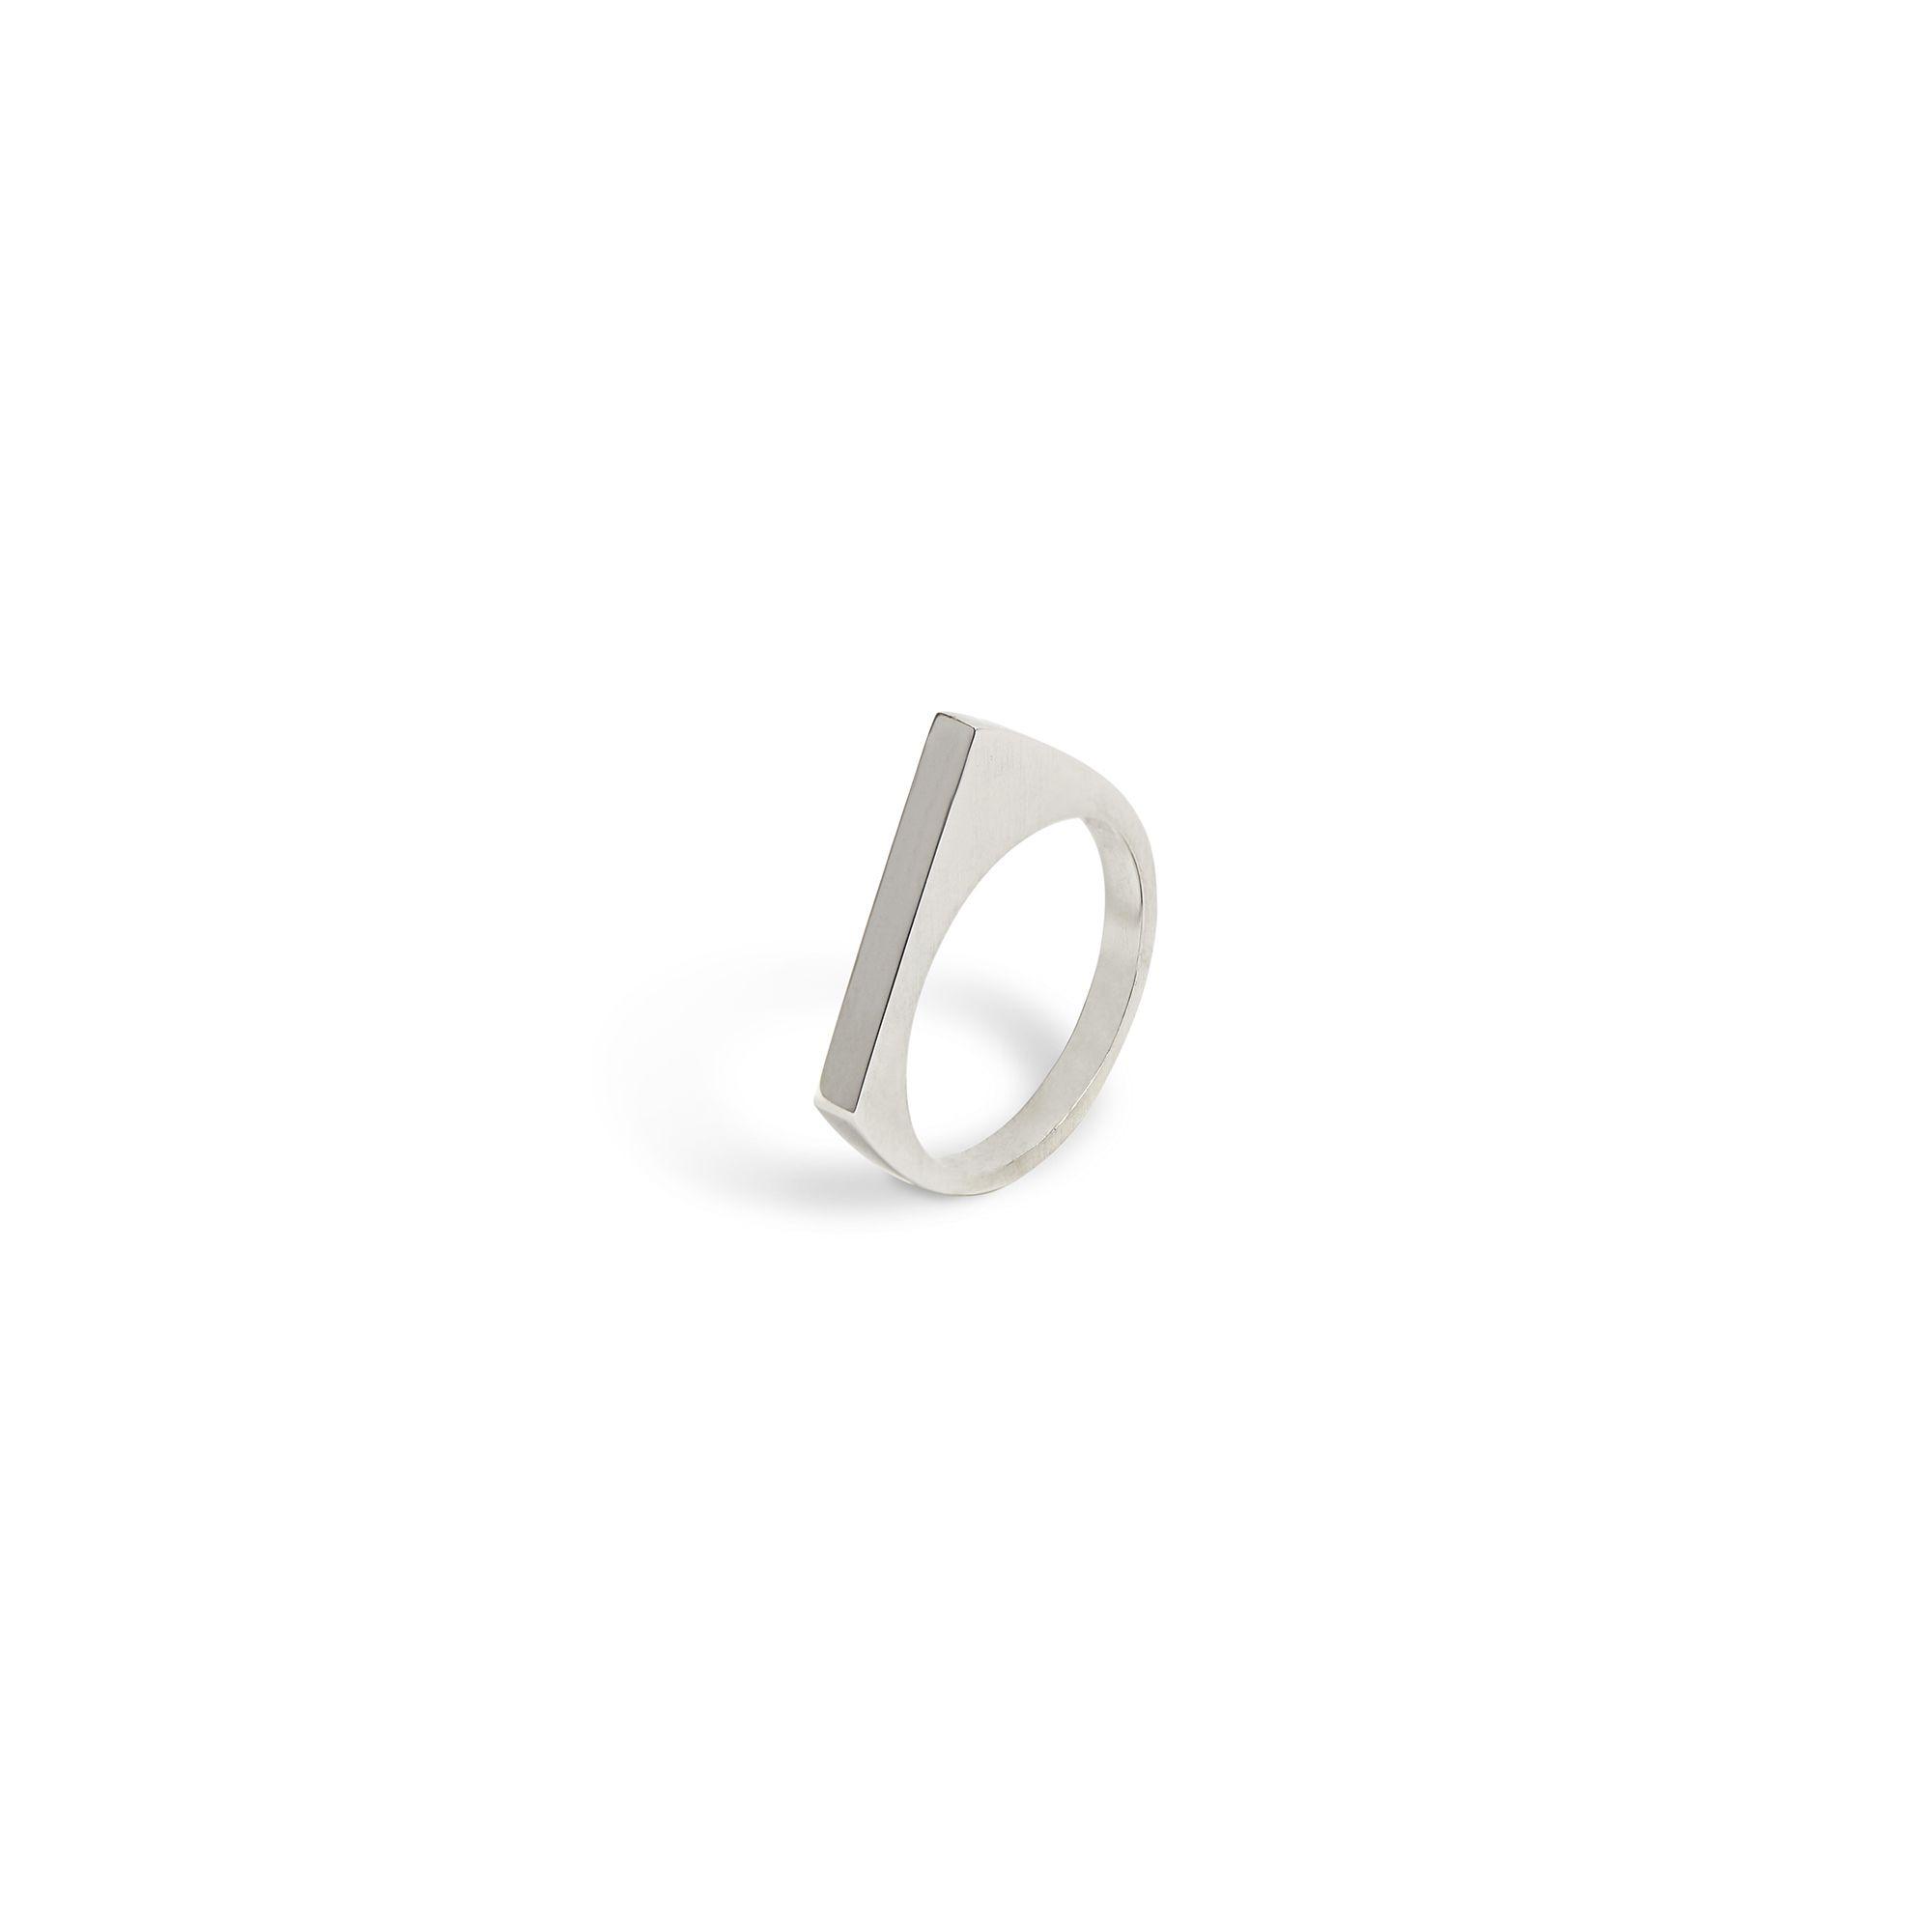 Modular 'Congiunzioni' point ring Silver modular ring